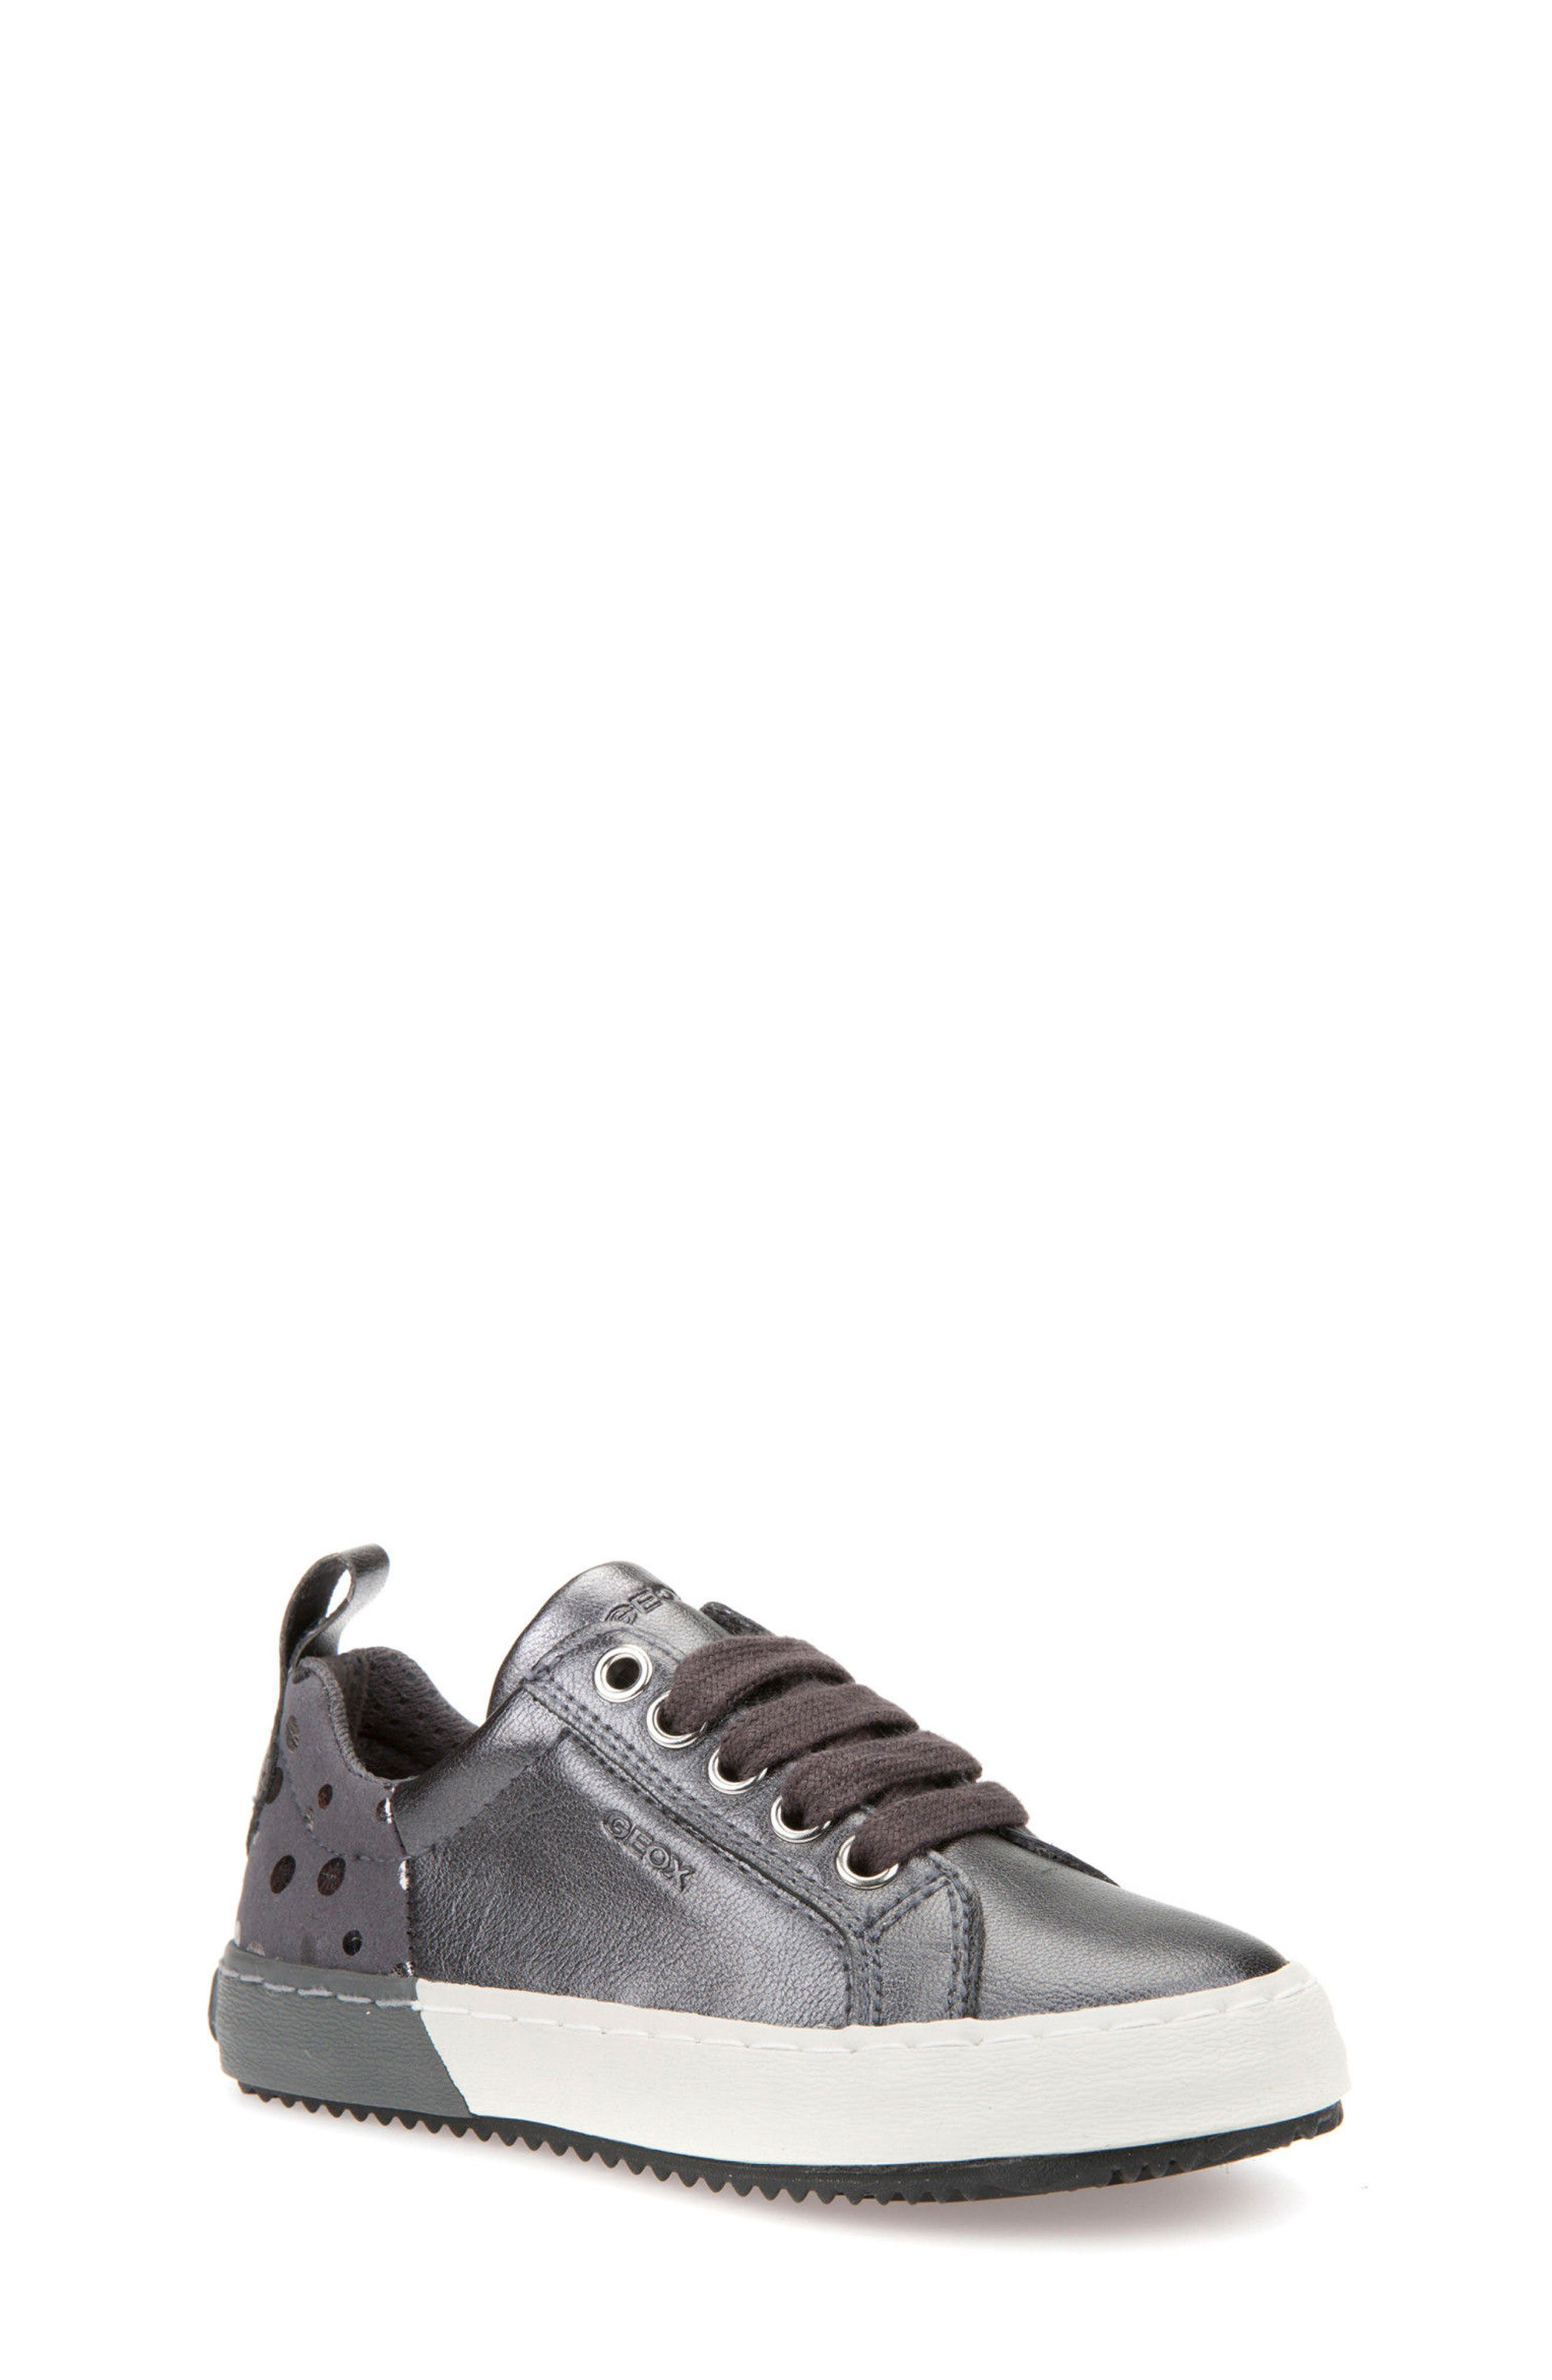 Geox Kalispera Girl Dotted Low-Top Sneaker (Toddler, Little Kid & Big Kid)